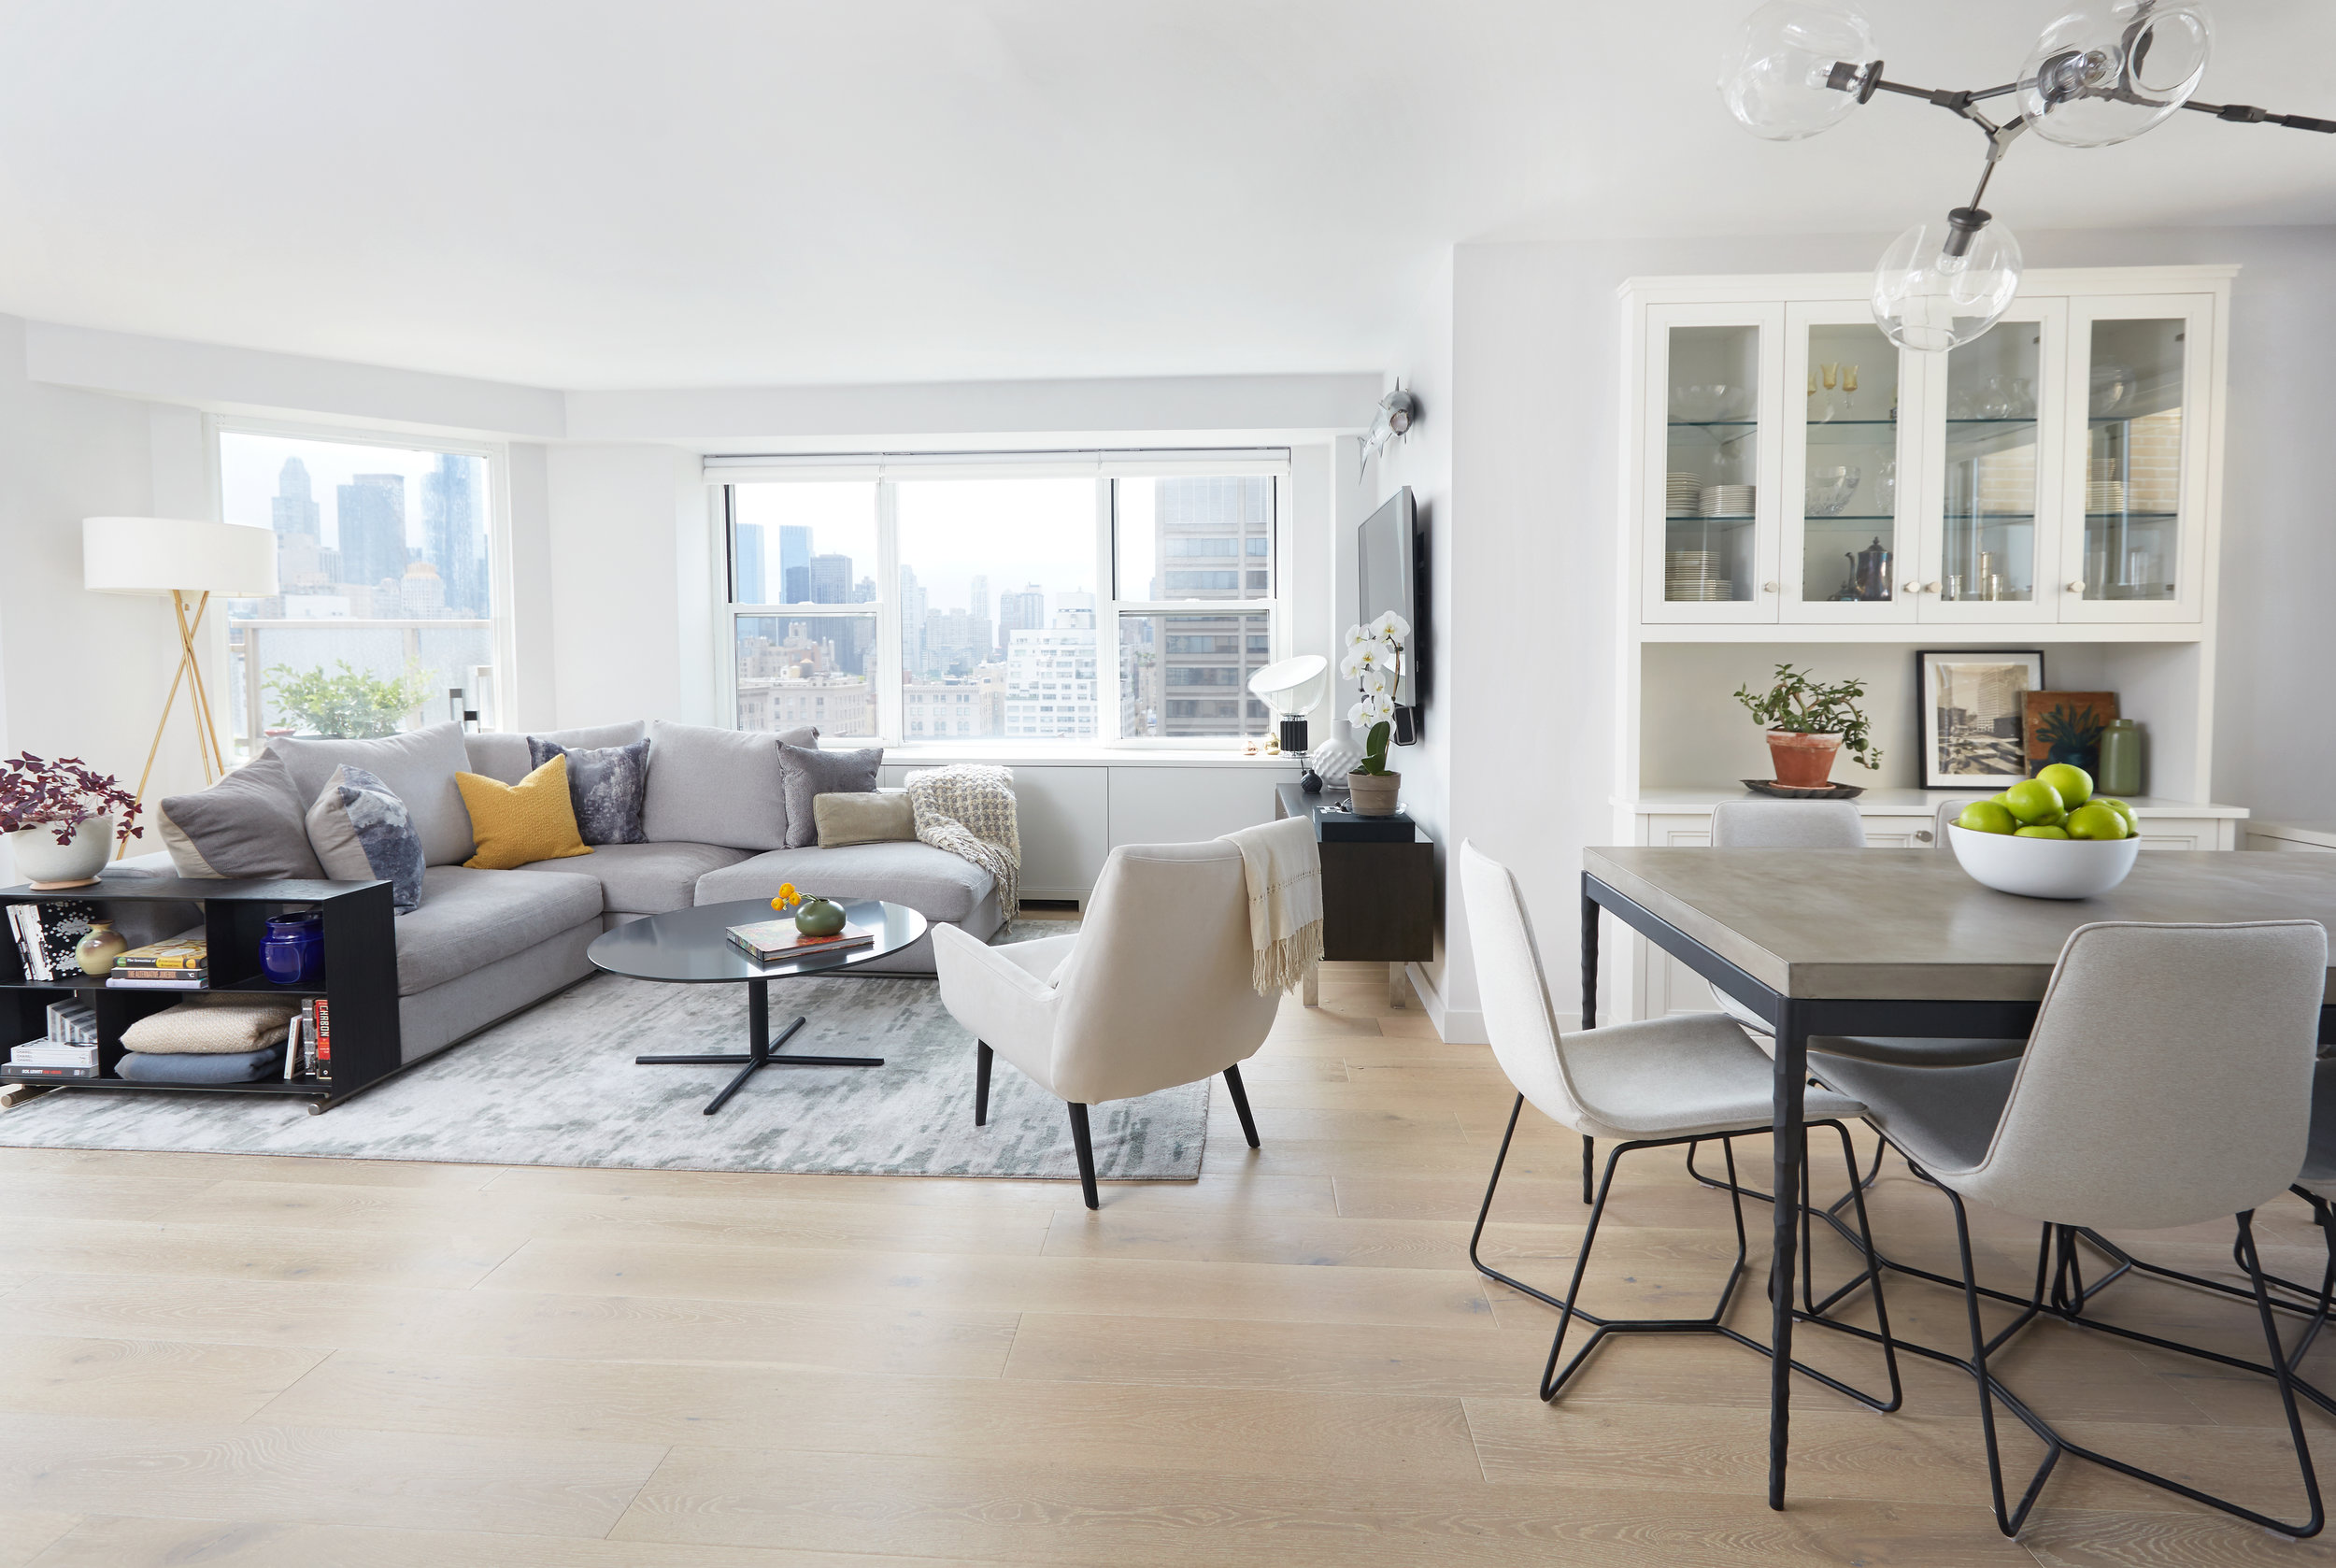 101-duplex-penthouse-full-gut-renovation